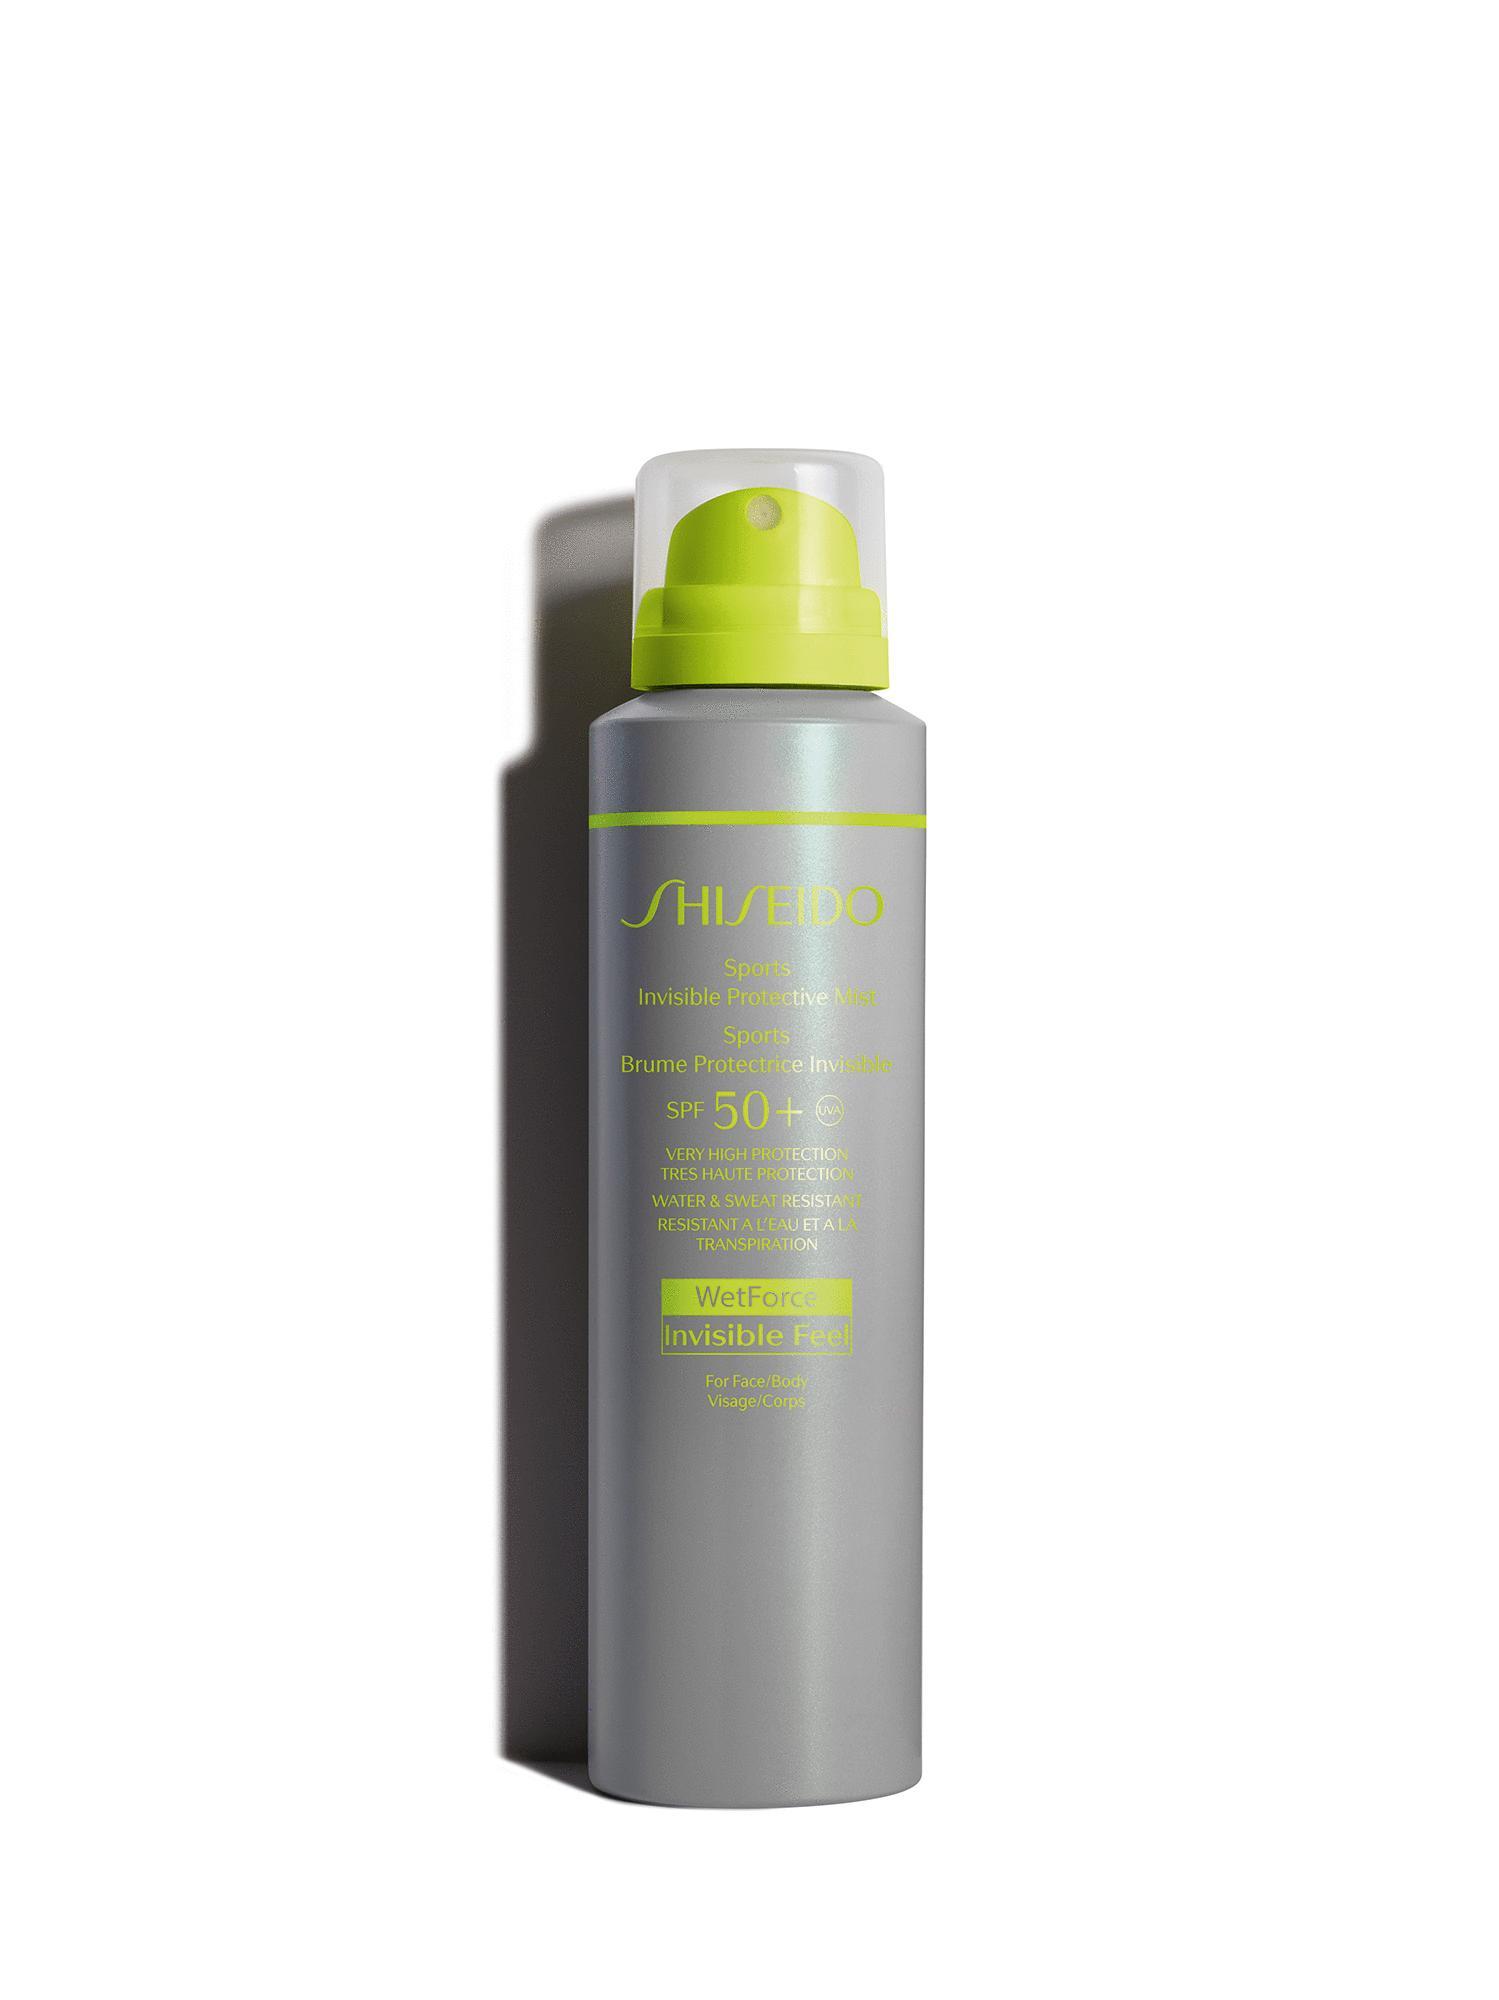 Shiseido Sports Invisible Protective Mist Spf50+  150 ml